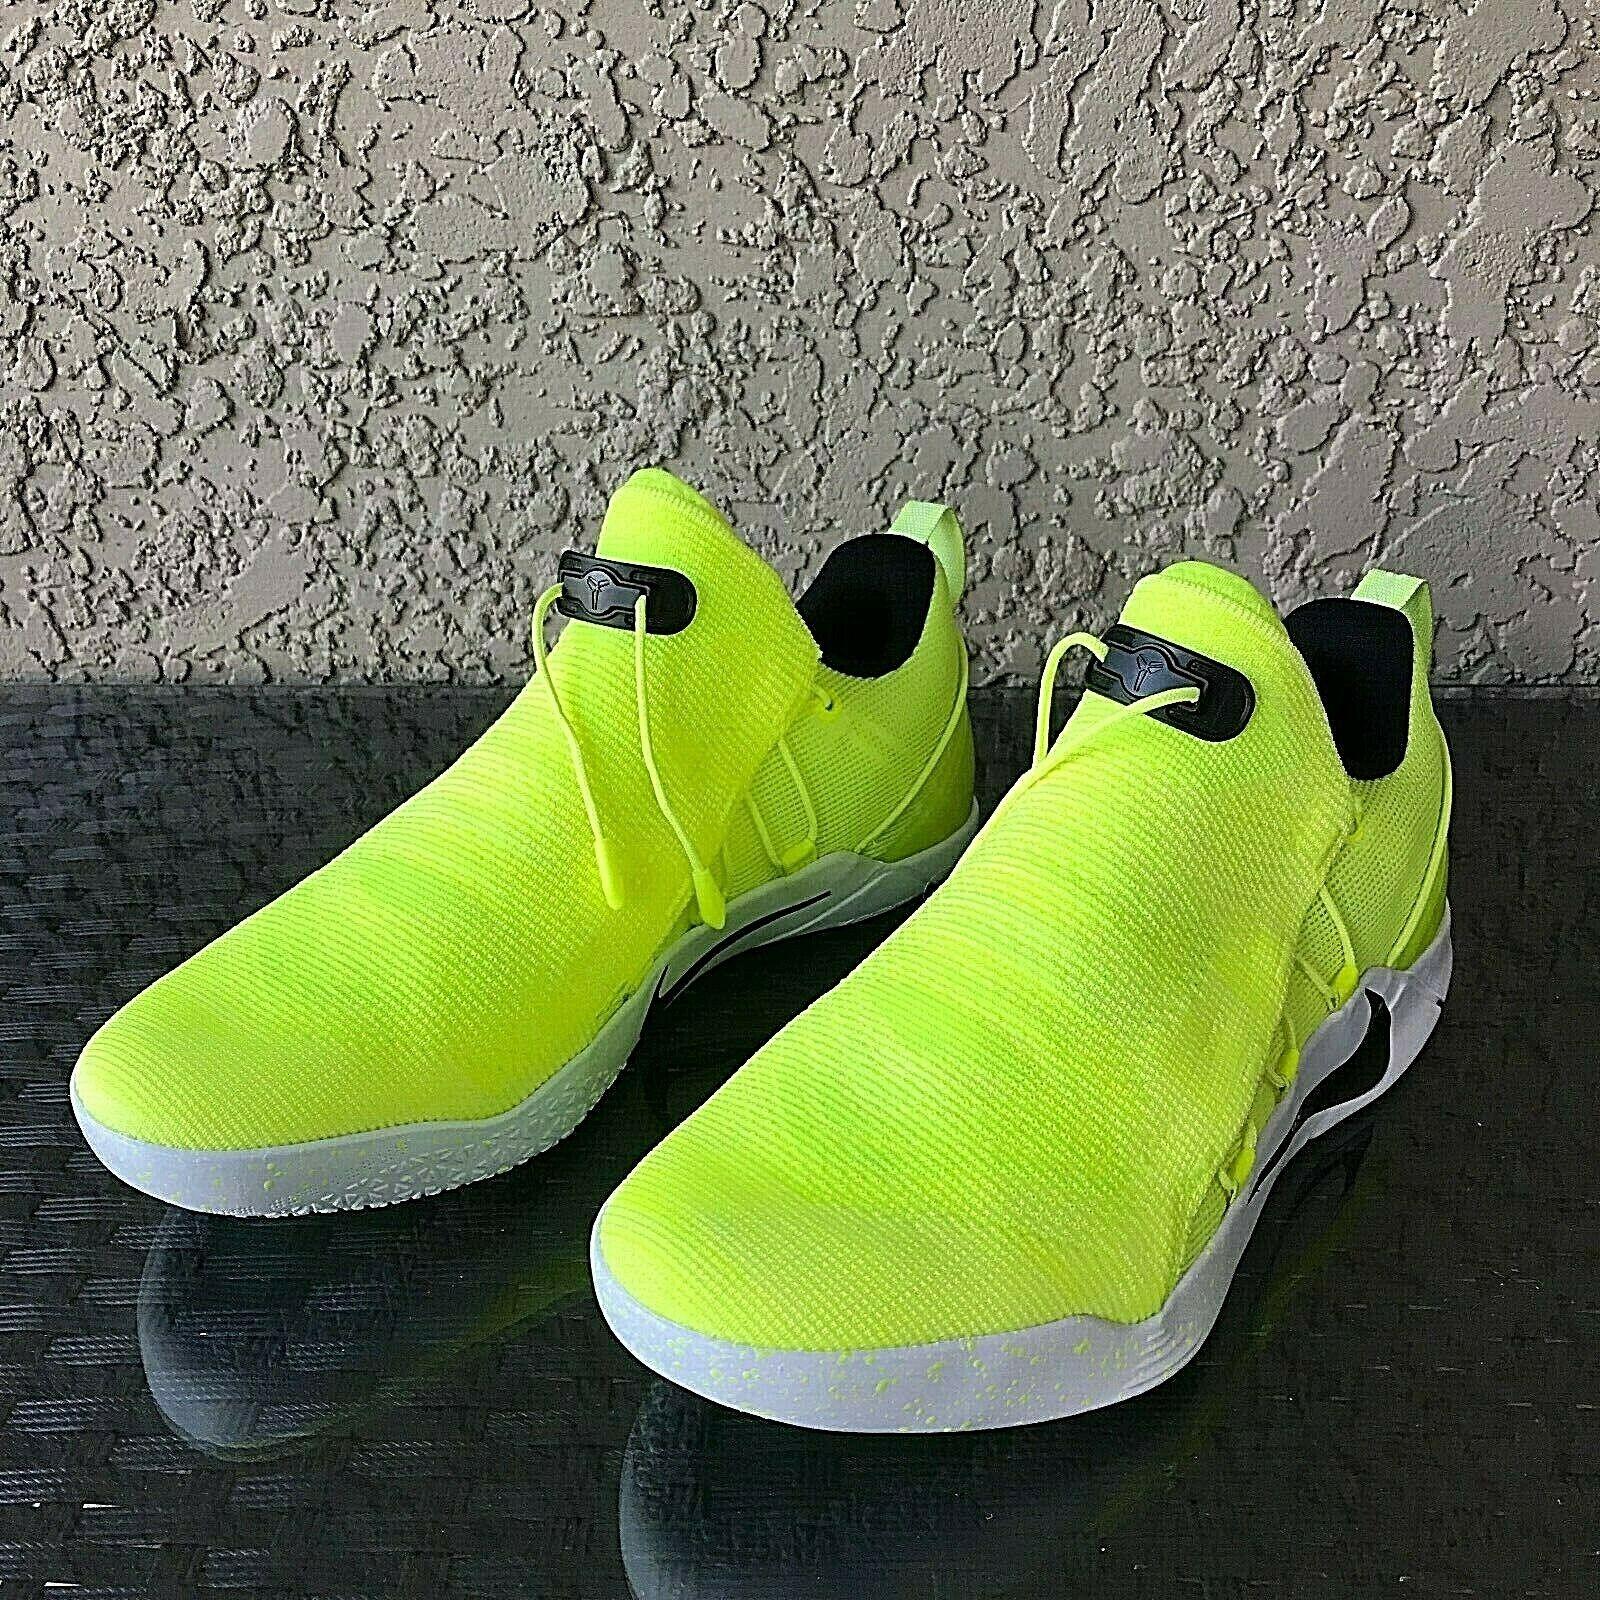 Nike Kobe Bryant AD NXT HMD Mens Size 10 Volt White Black 916832-710 Rare